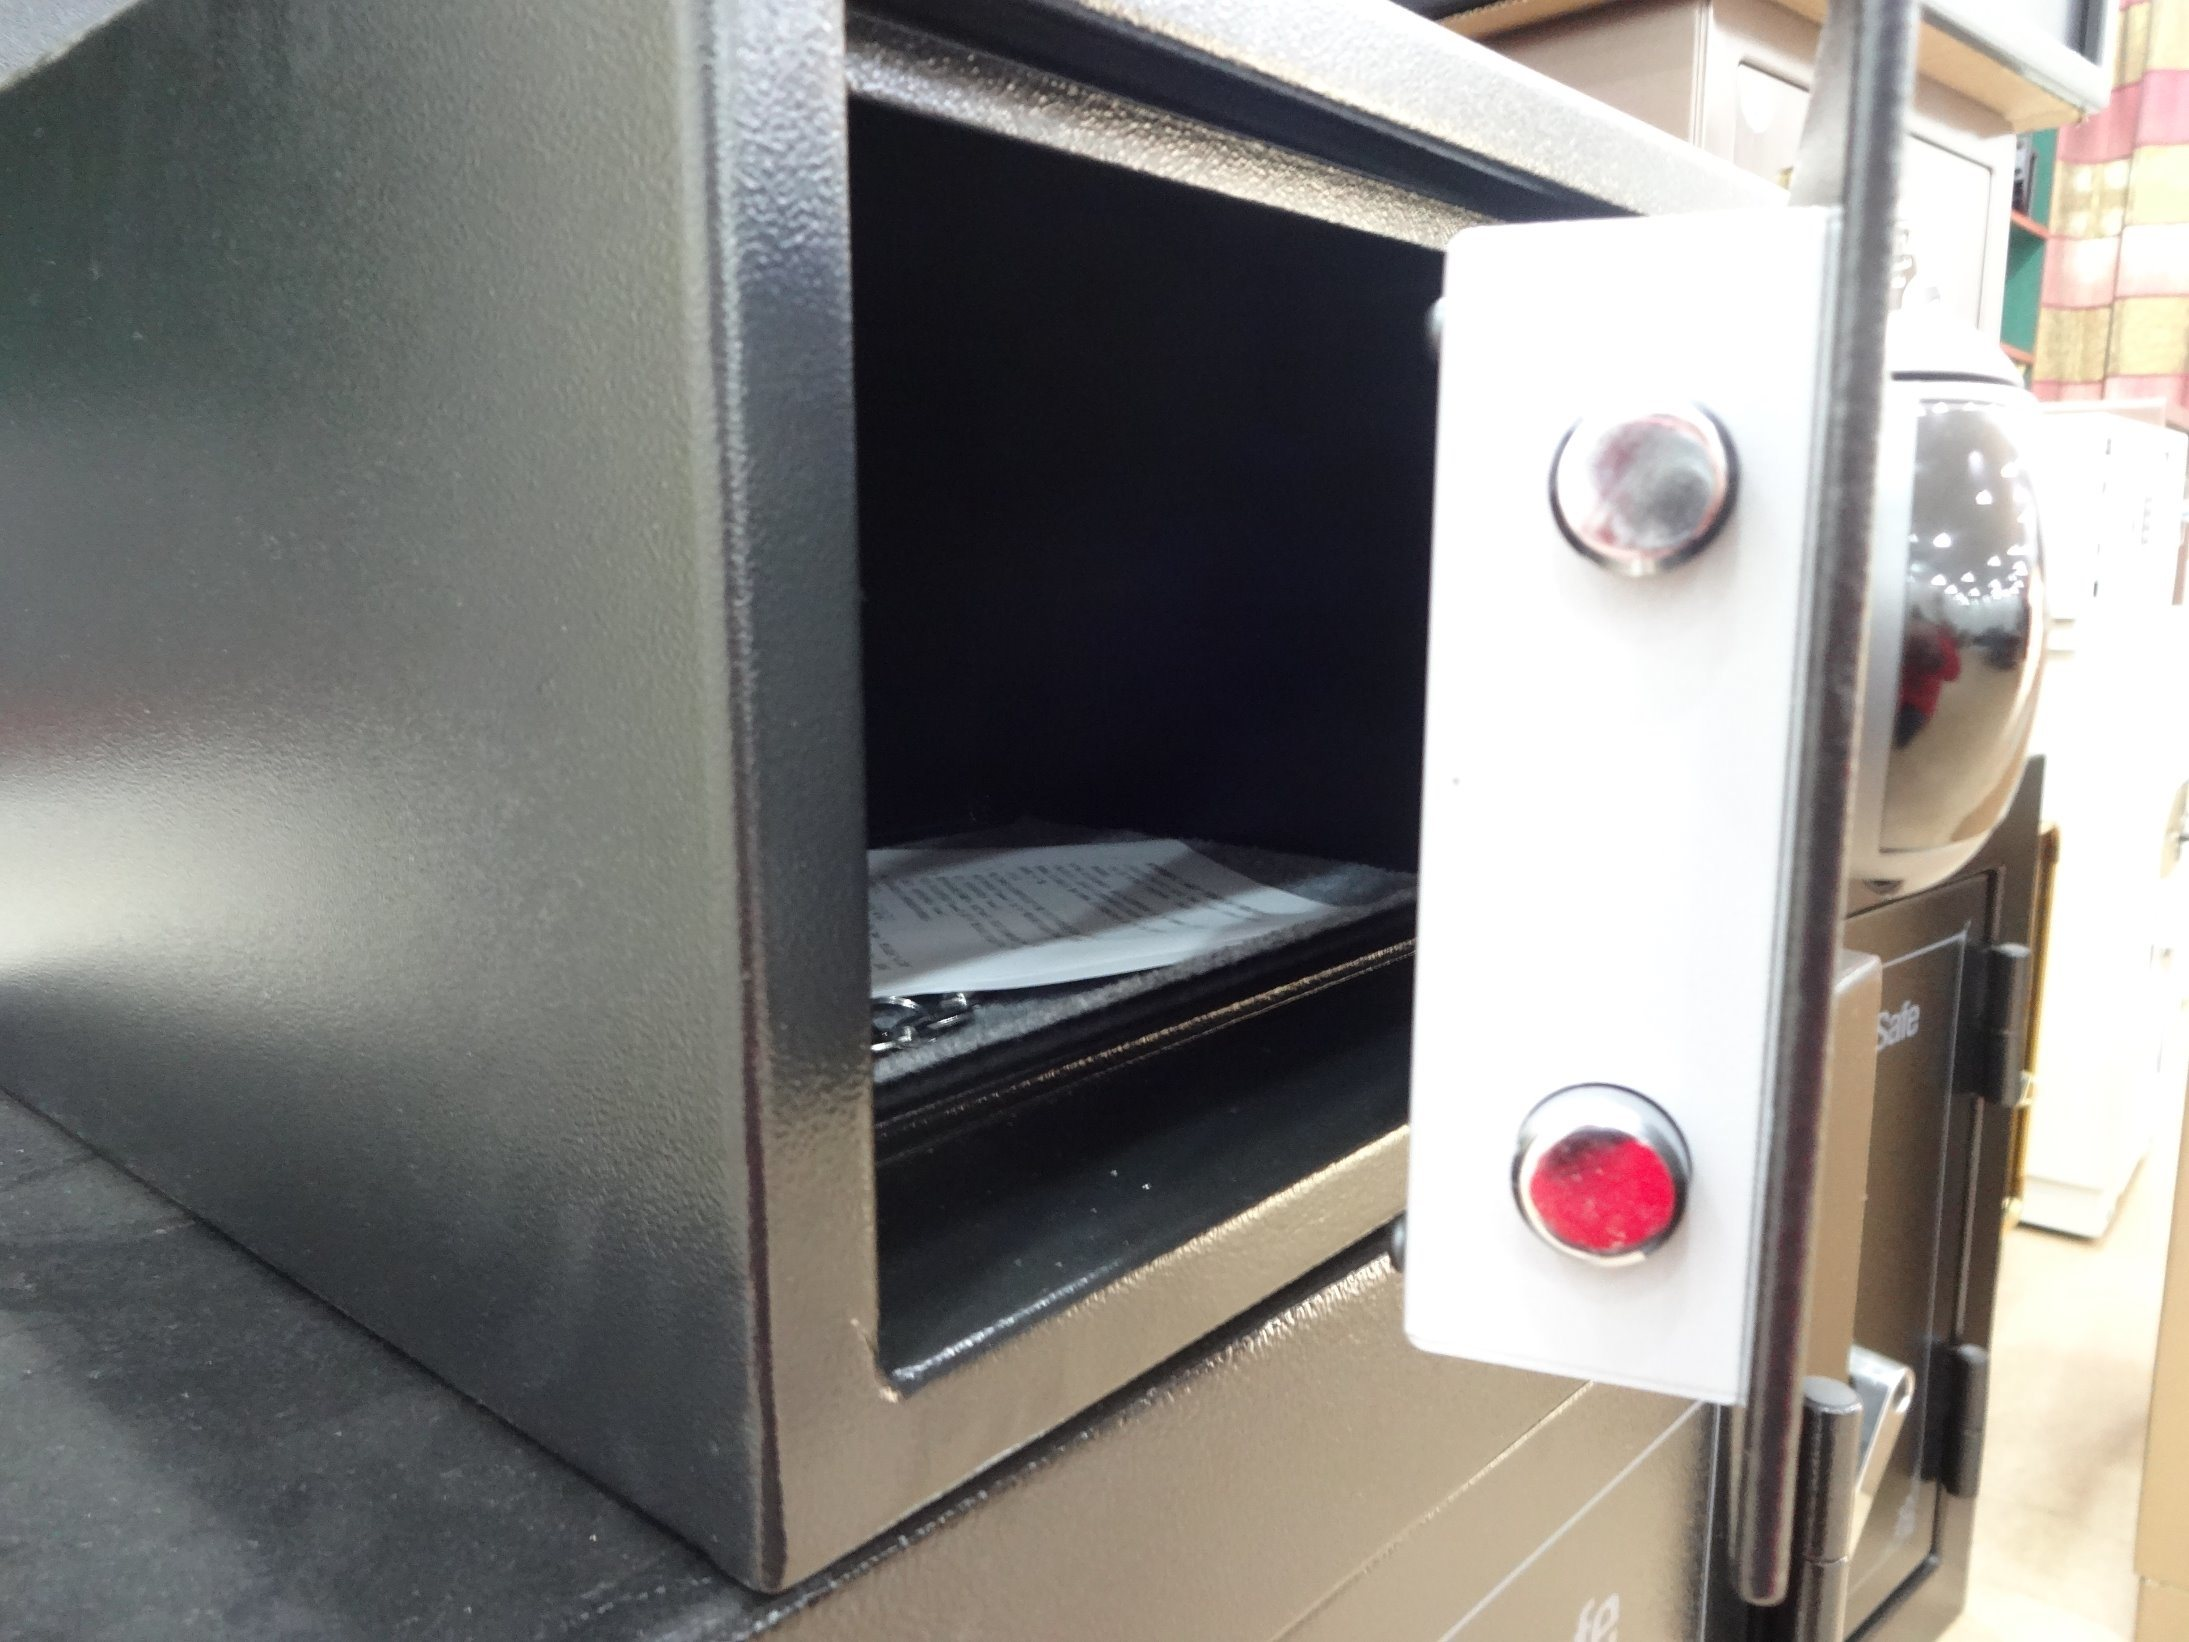 Hotel Safe Box with Digital Lock - New III